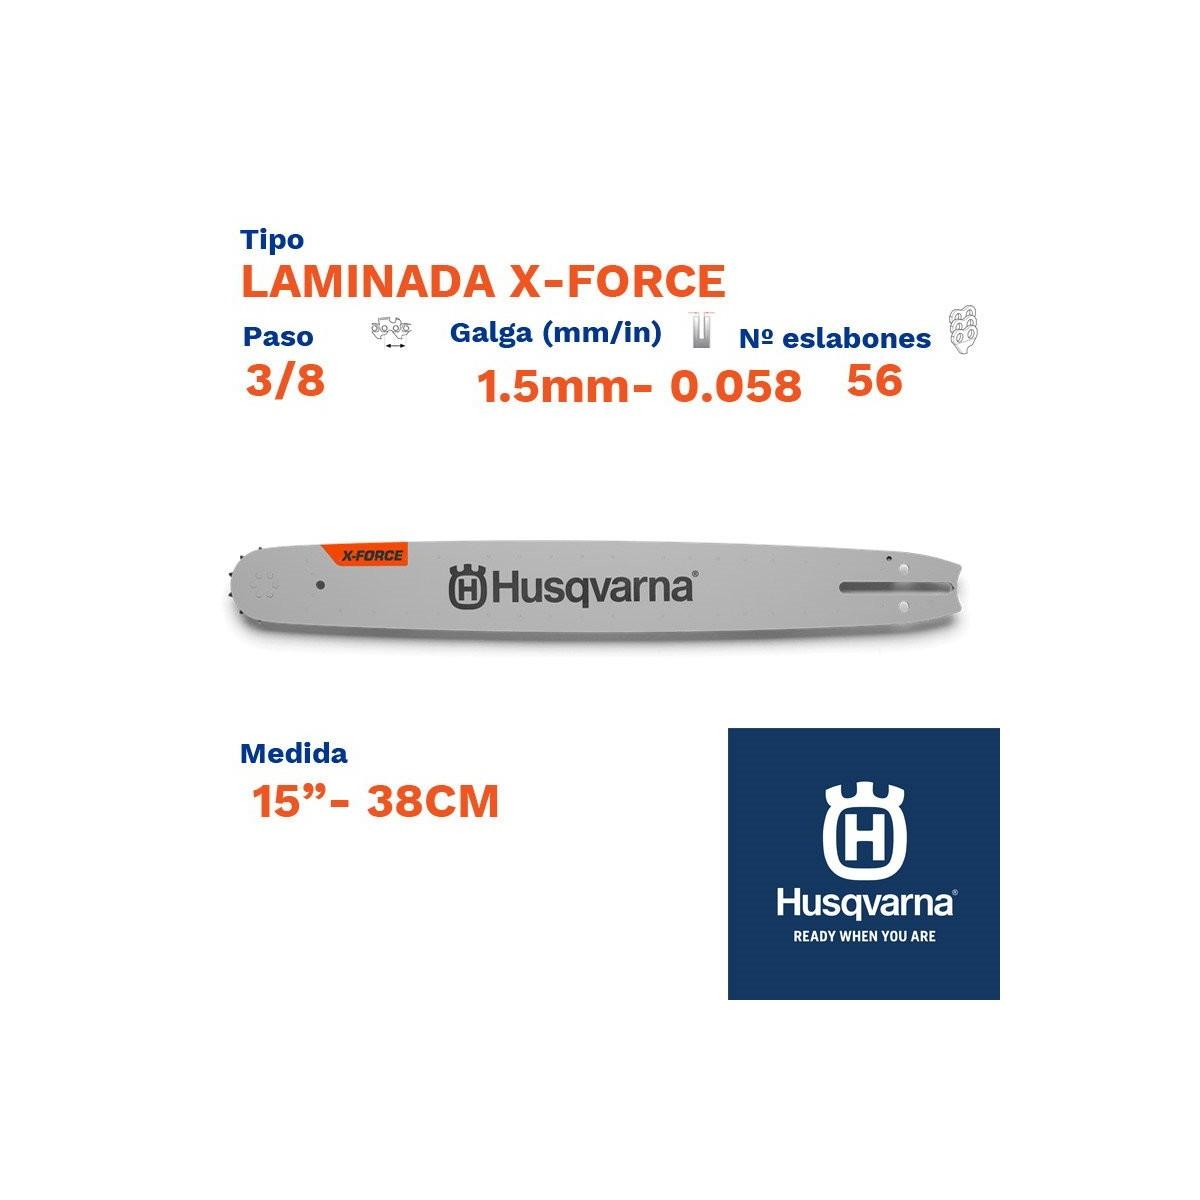 "Husqvarna espada laminada x-force 1.5mm 56 eslabones-pc 3/8   15""- 38cm"